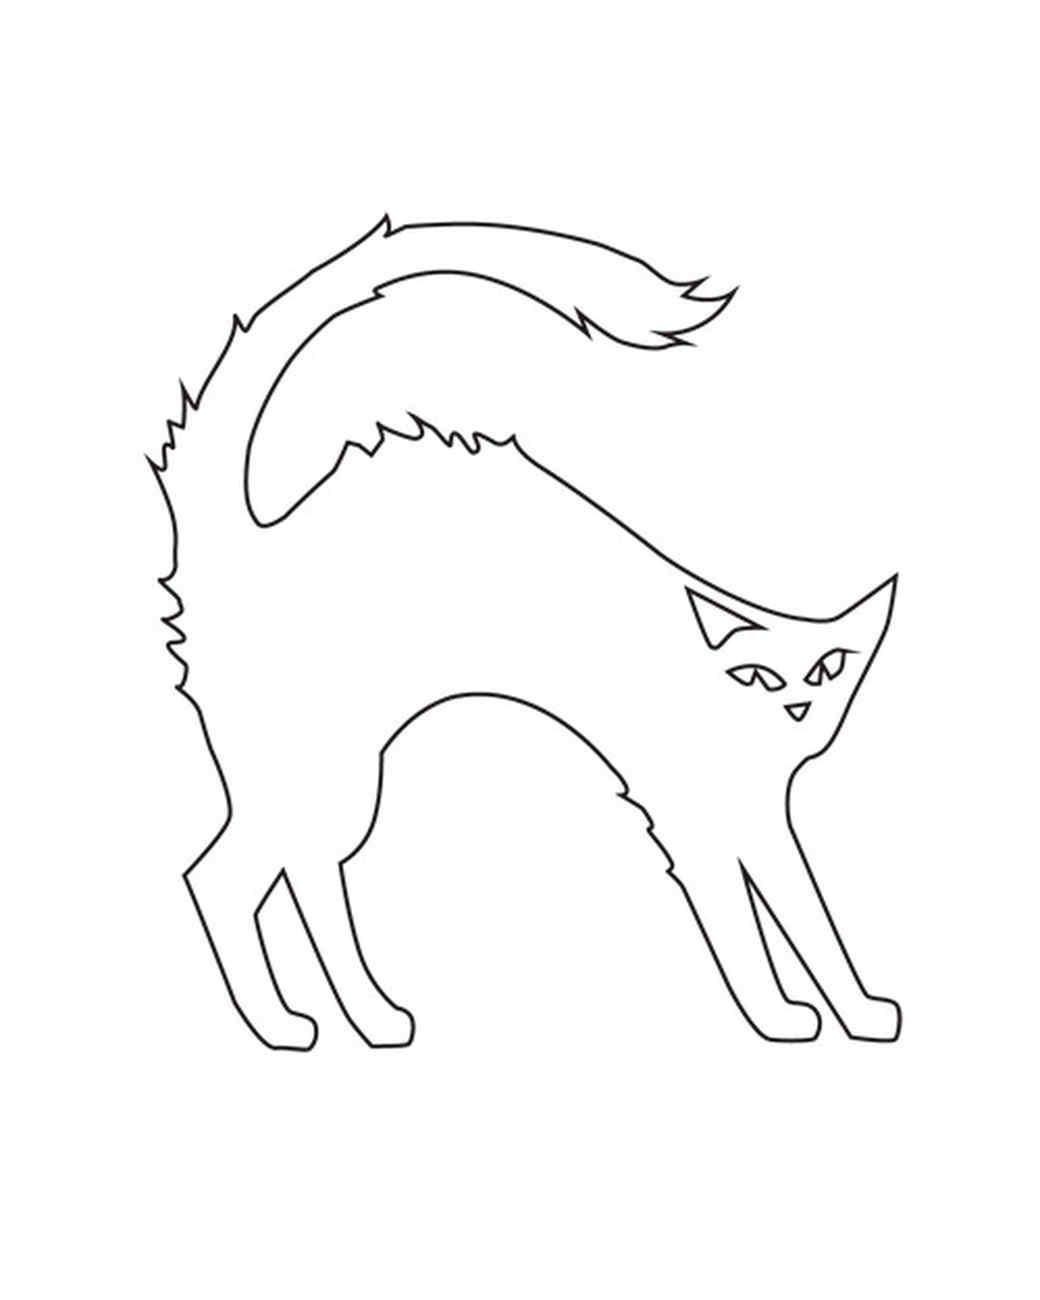 la_1007_pumpkinwkbk_cat.jpg